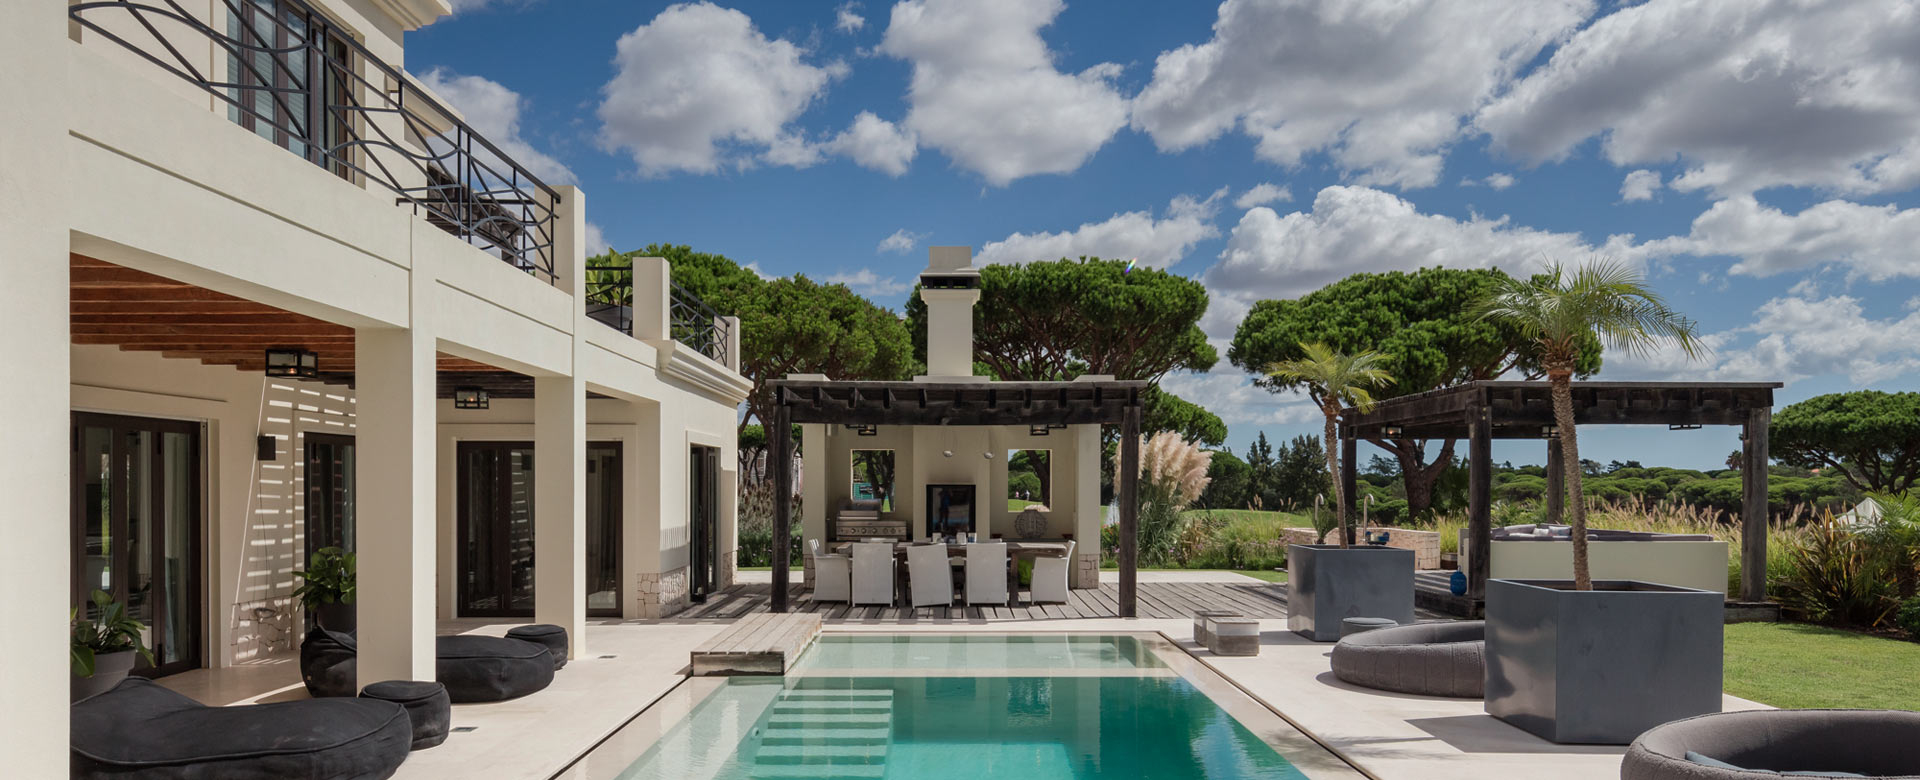 Location De Villa De Luxe Au Portugal   Villanovo avec Location Maison Avec Piscine Portugal